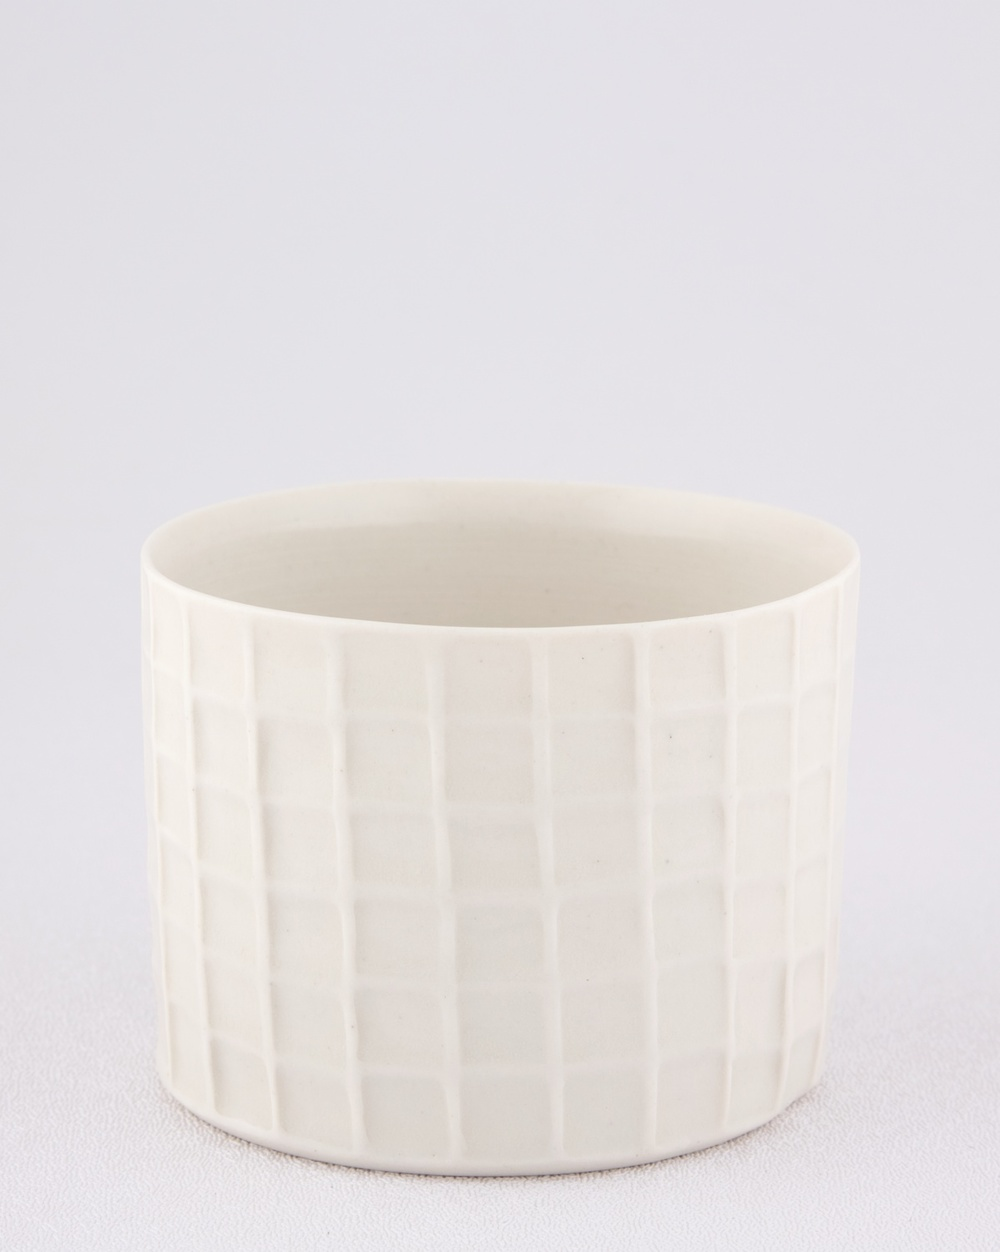 Shio Kusaka  Untitled (cup)  2009 Porcelain 2 ⅝h x 3 ½w in SK016